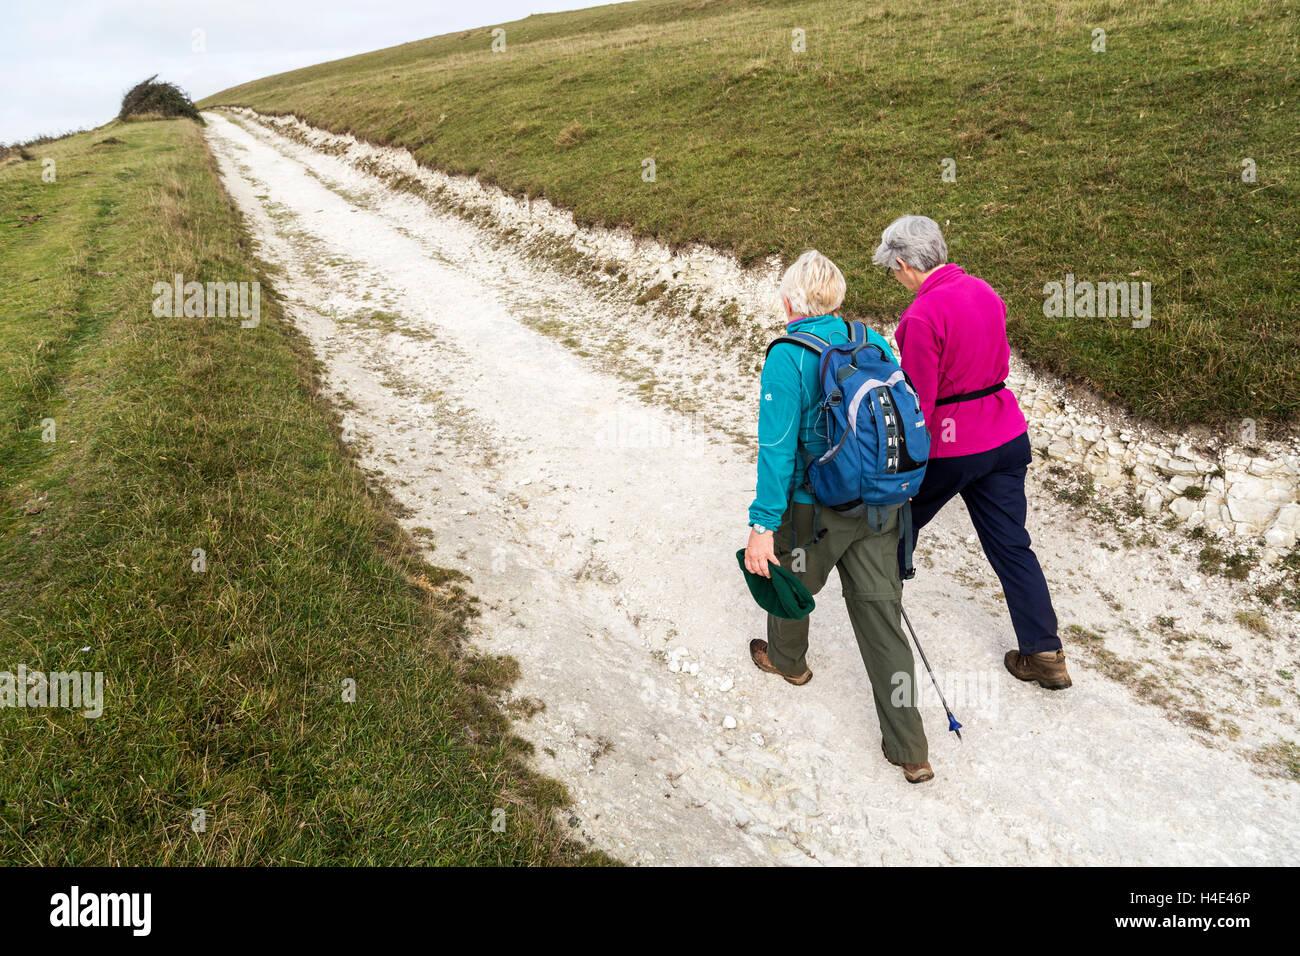 Two people walking on chalk track, Compton Down, Isle of Wight, UK - Stock Image